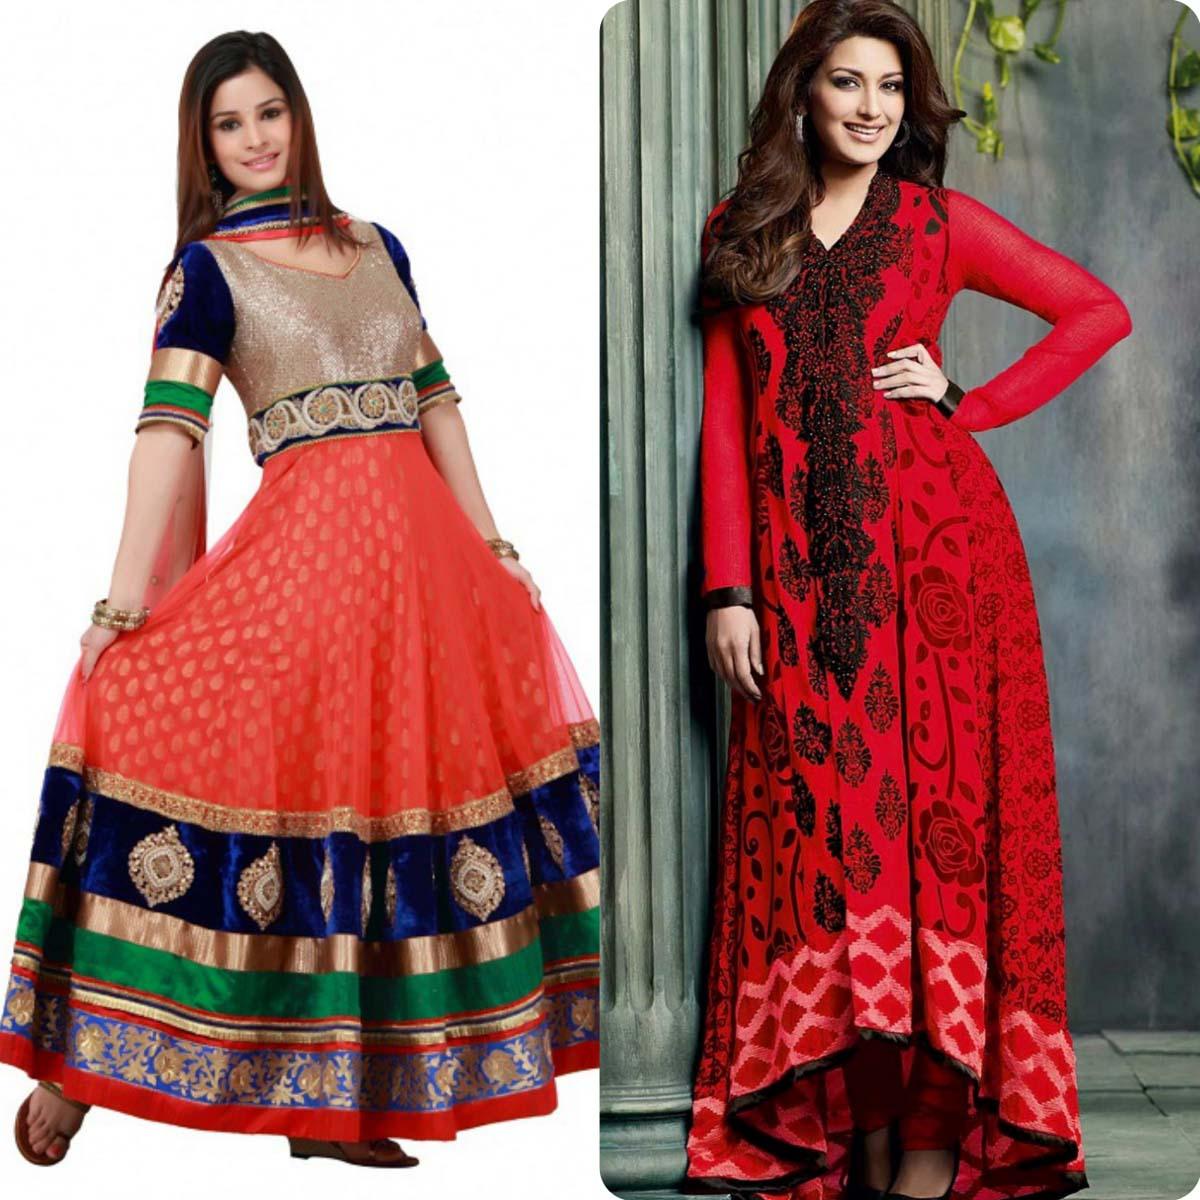 Indian Stylish Umbrella Frock and Churidar Dresses for Girls 2016-2017 (11)